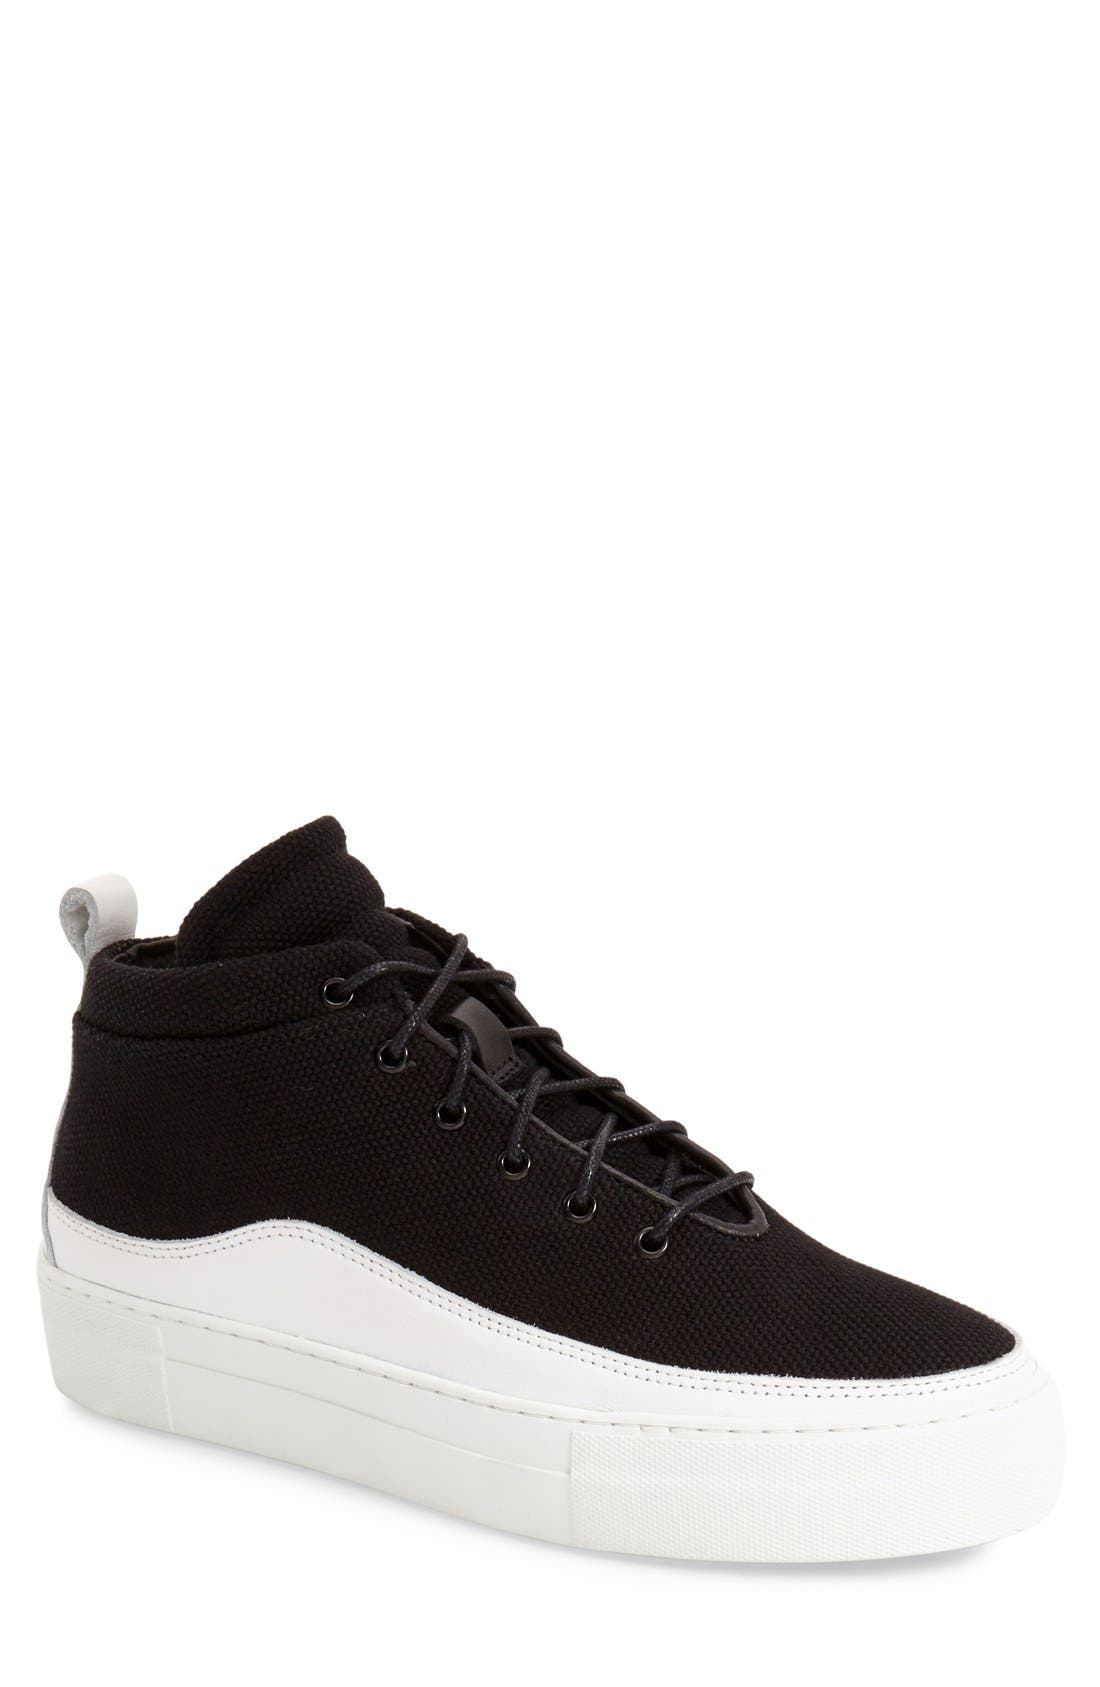 Public School 'Braeburn' High Top Sneaker (Men)